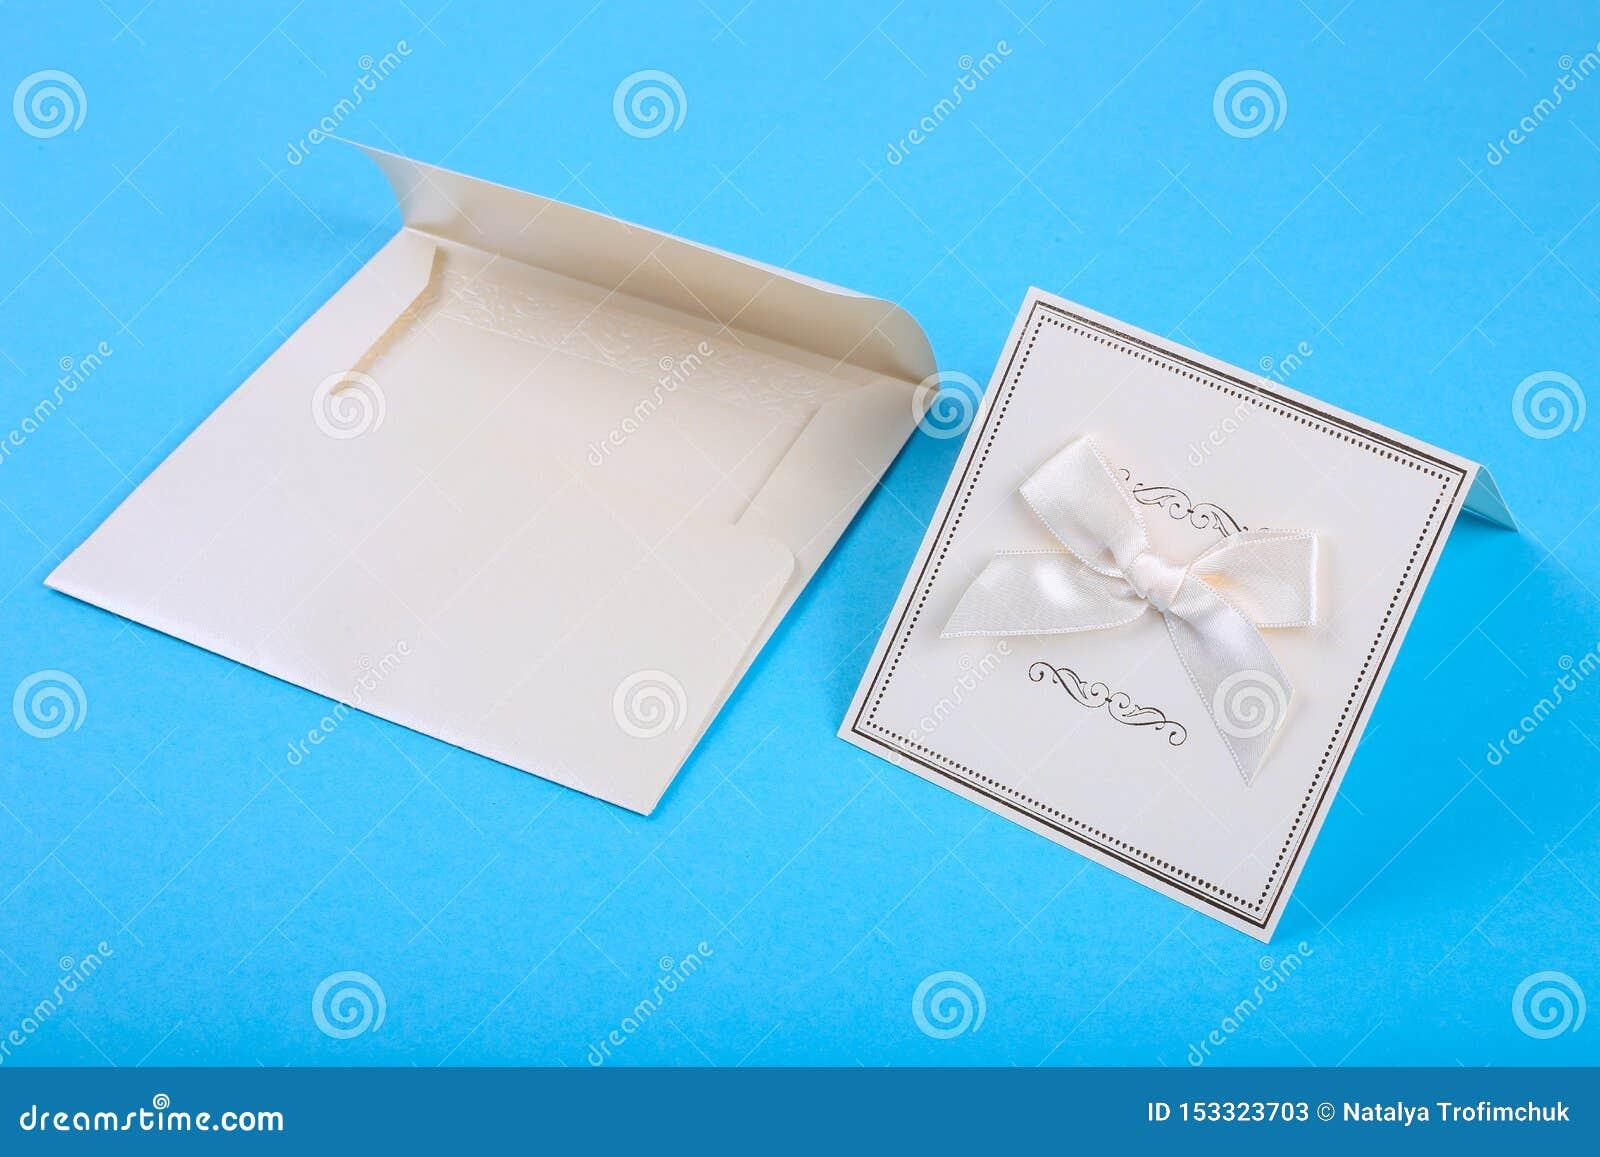 Lege kaart in blauwe envelop op blauwe achtergrond Vakantie en uitnodigingsmodel